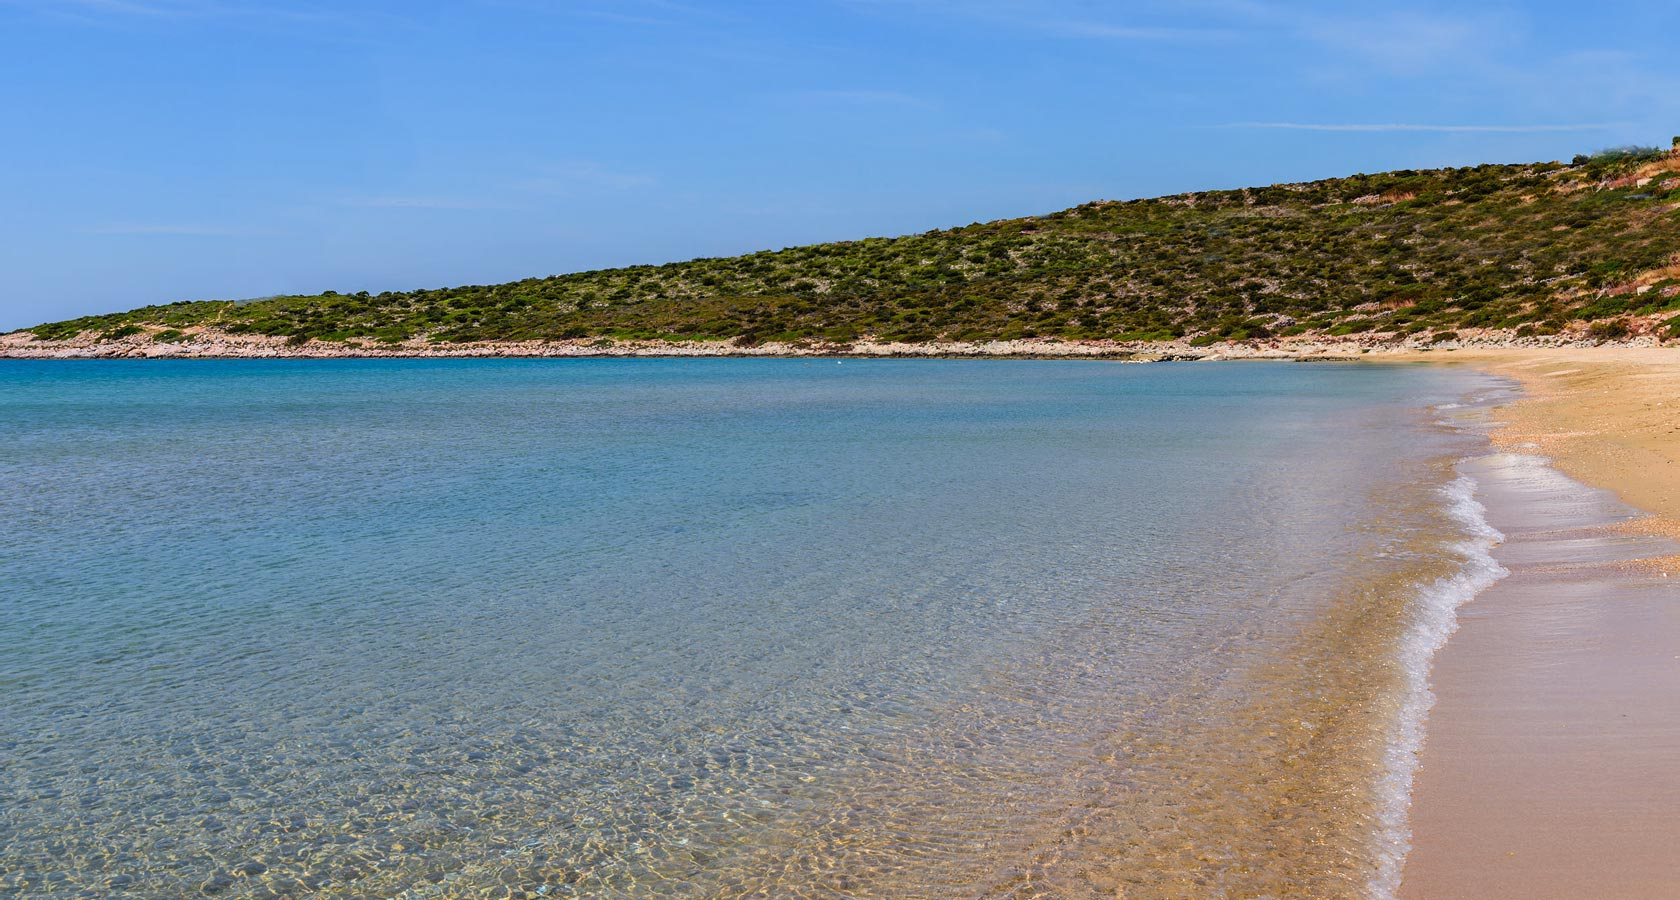 Paros sandy beach